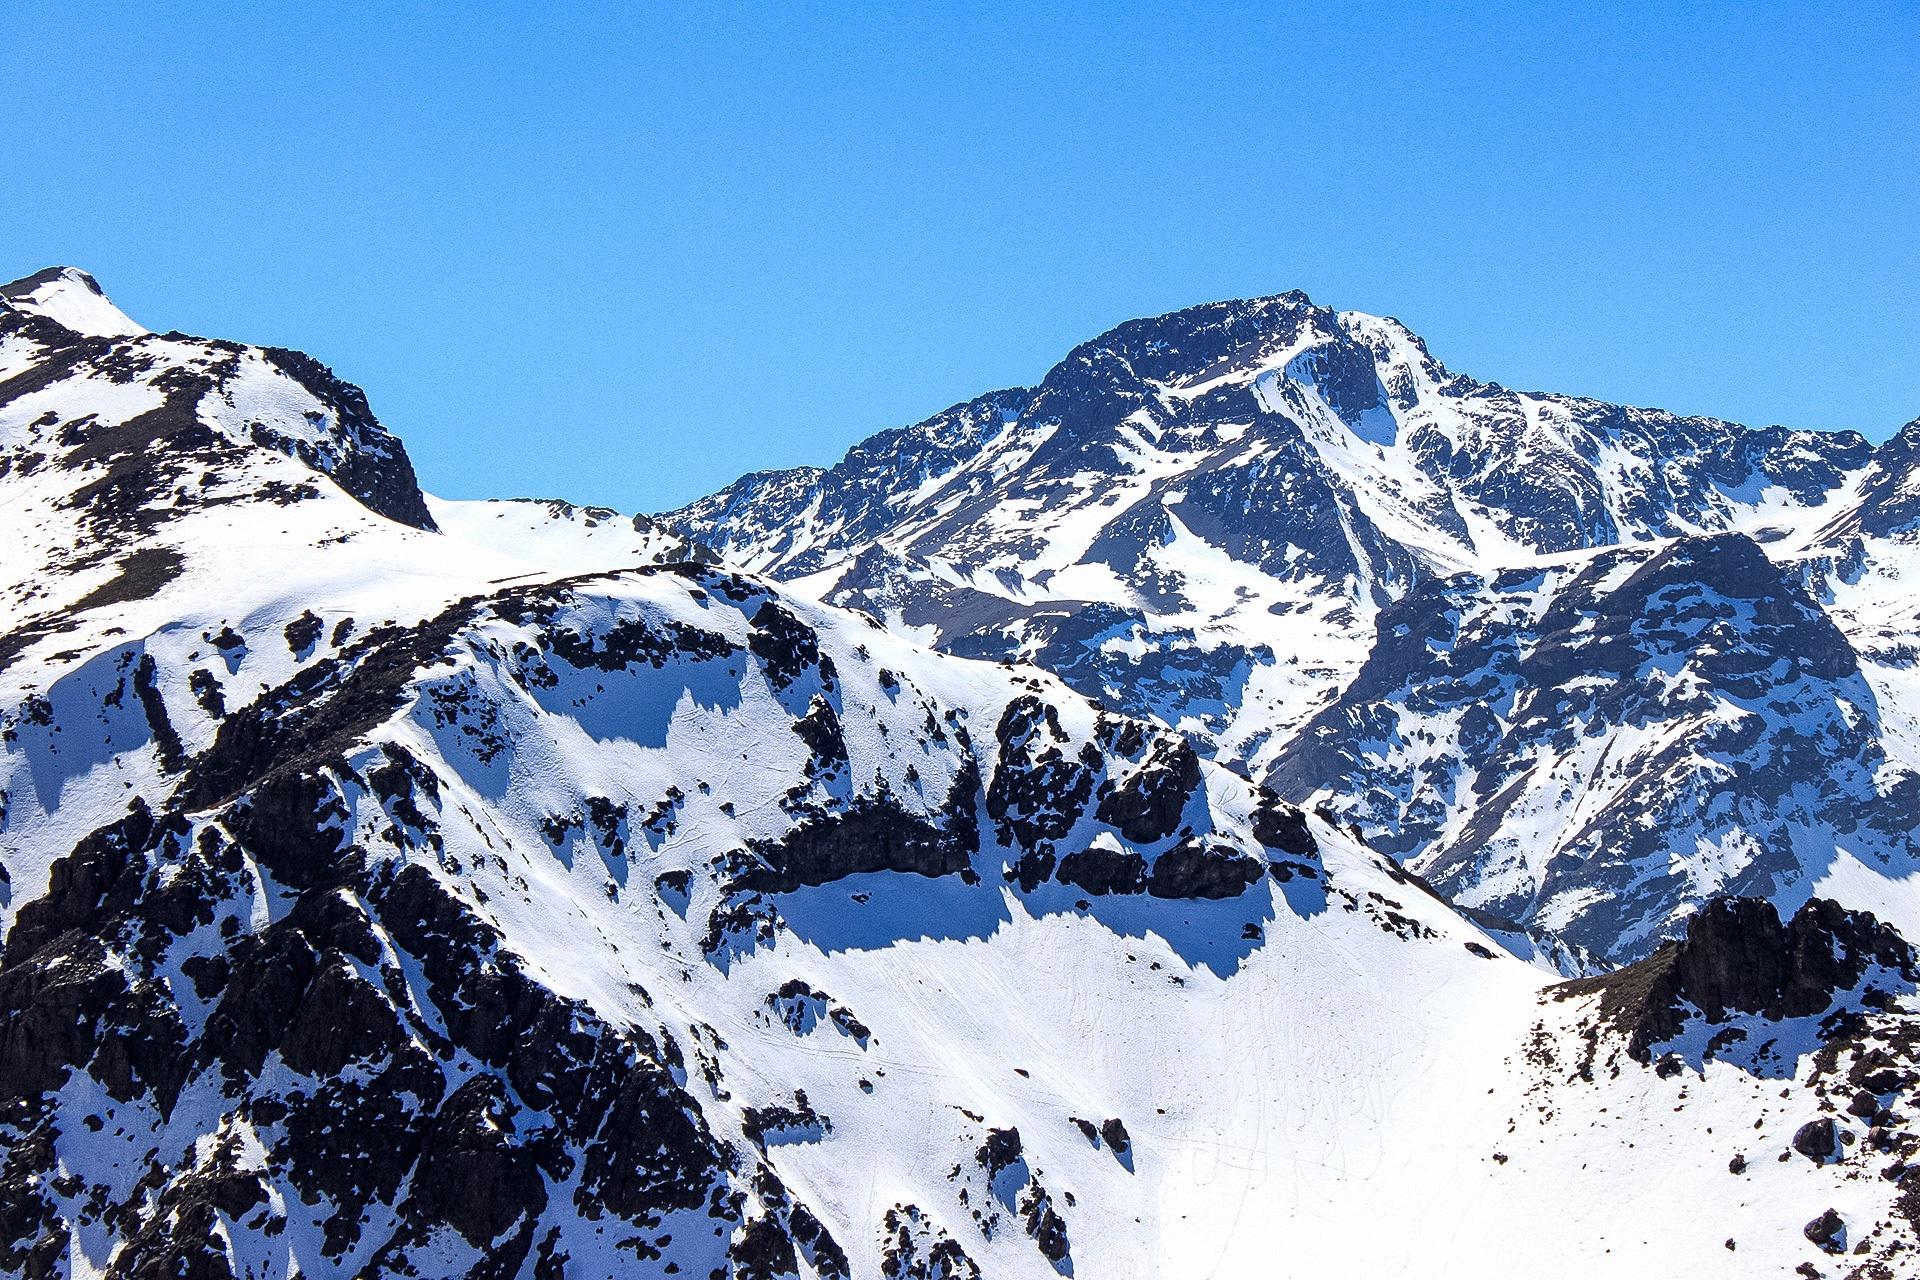 free images : snow, winter, peak, mountain range, weather, snowy